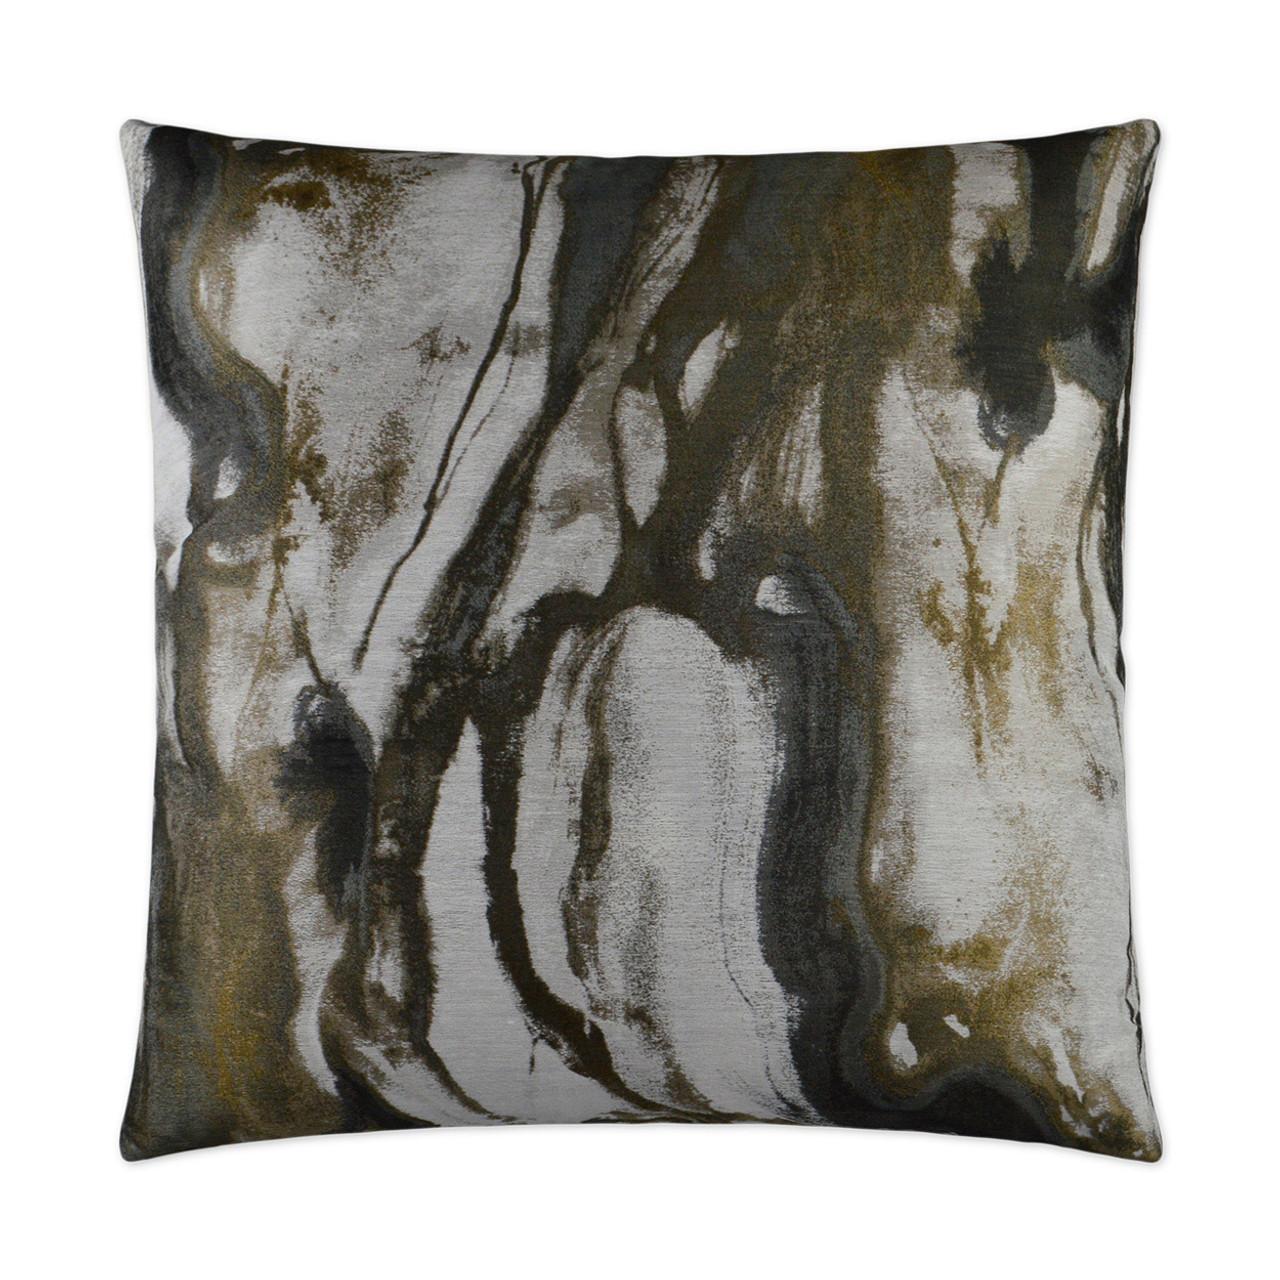 Marbella Throw Pillow - Quartz